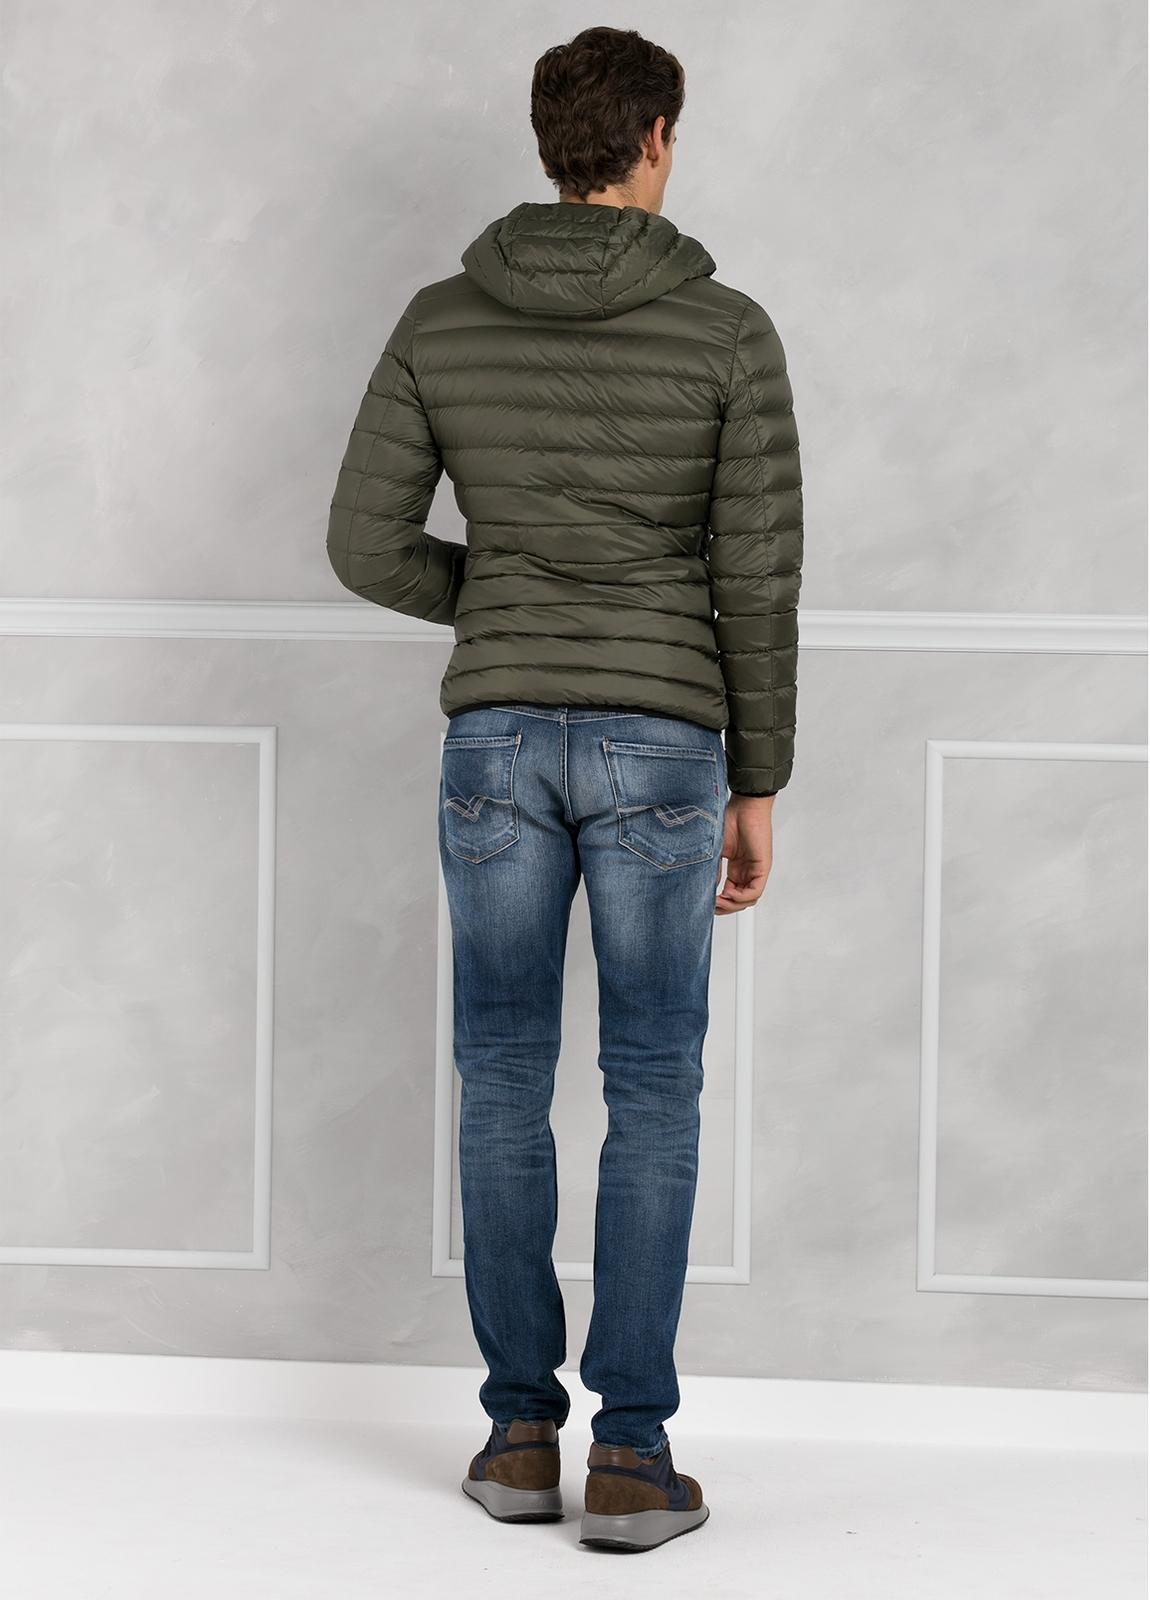 Chaqueta con capucha modelo ZEFIRO color kaki, tejido técnico. - Ítem2